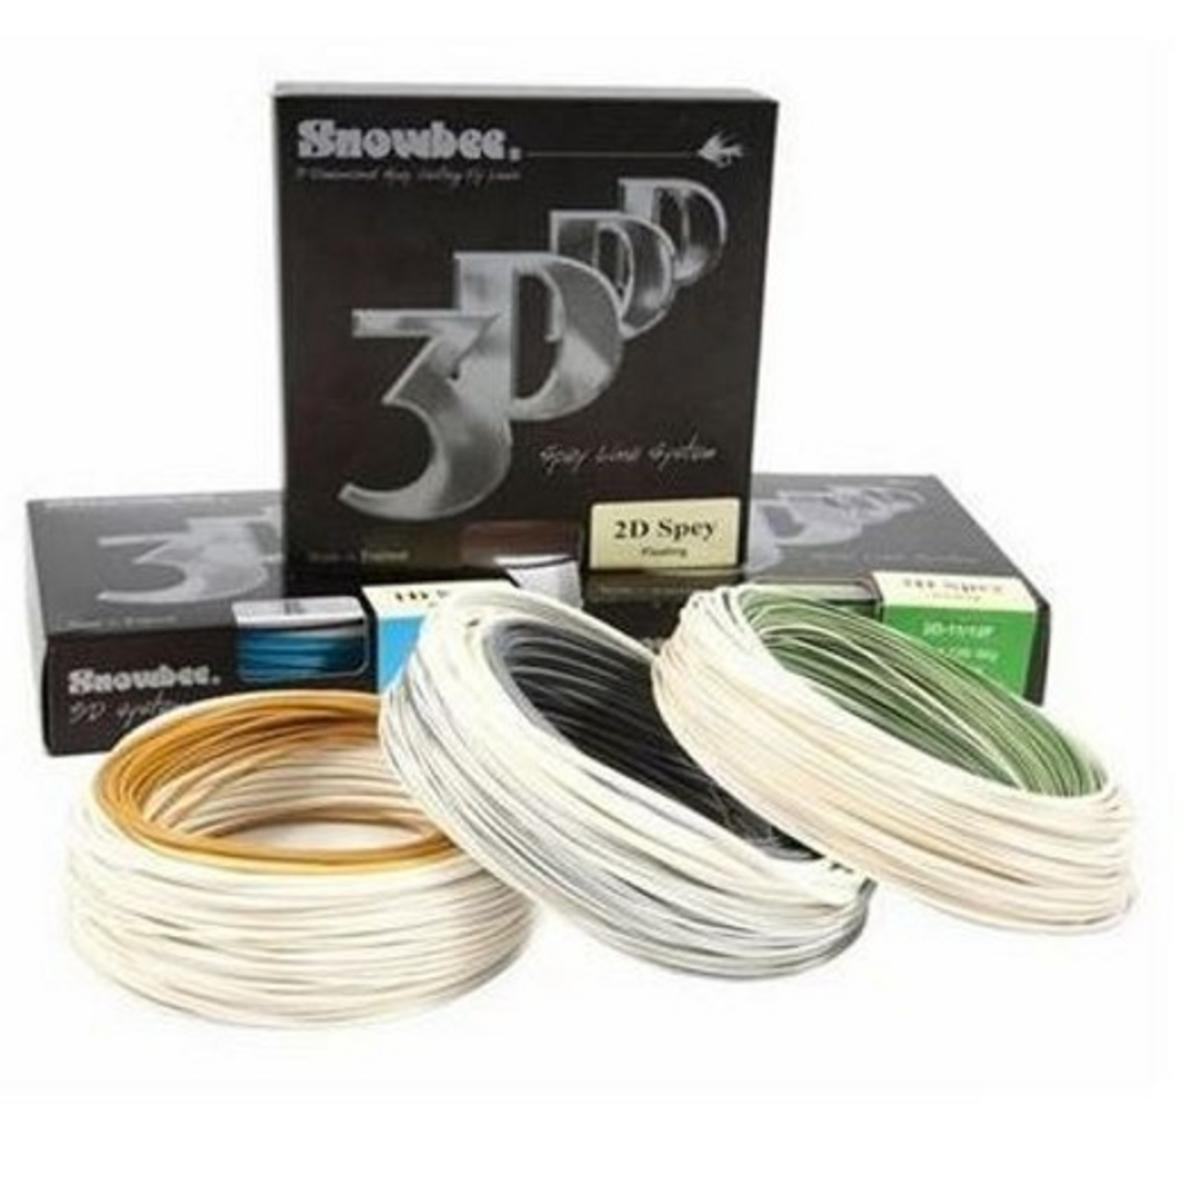 SNOWBEE SPEY LINE 1D 2D 3D FL/INT/SINK TIP 8-9-10-11-12